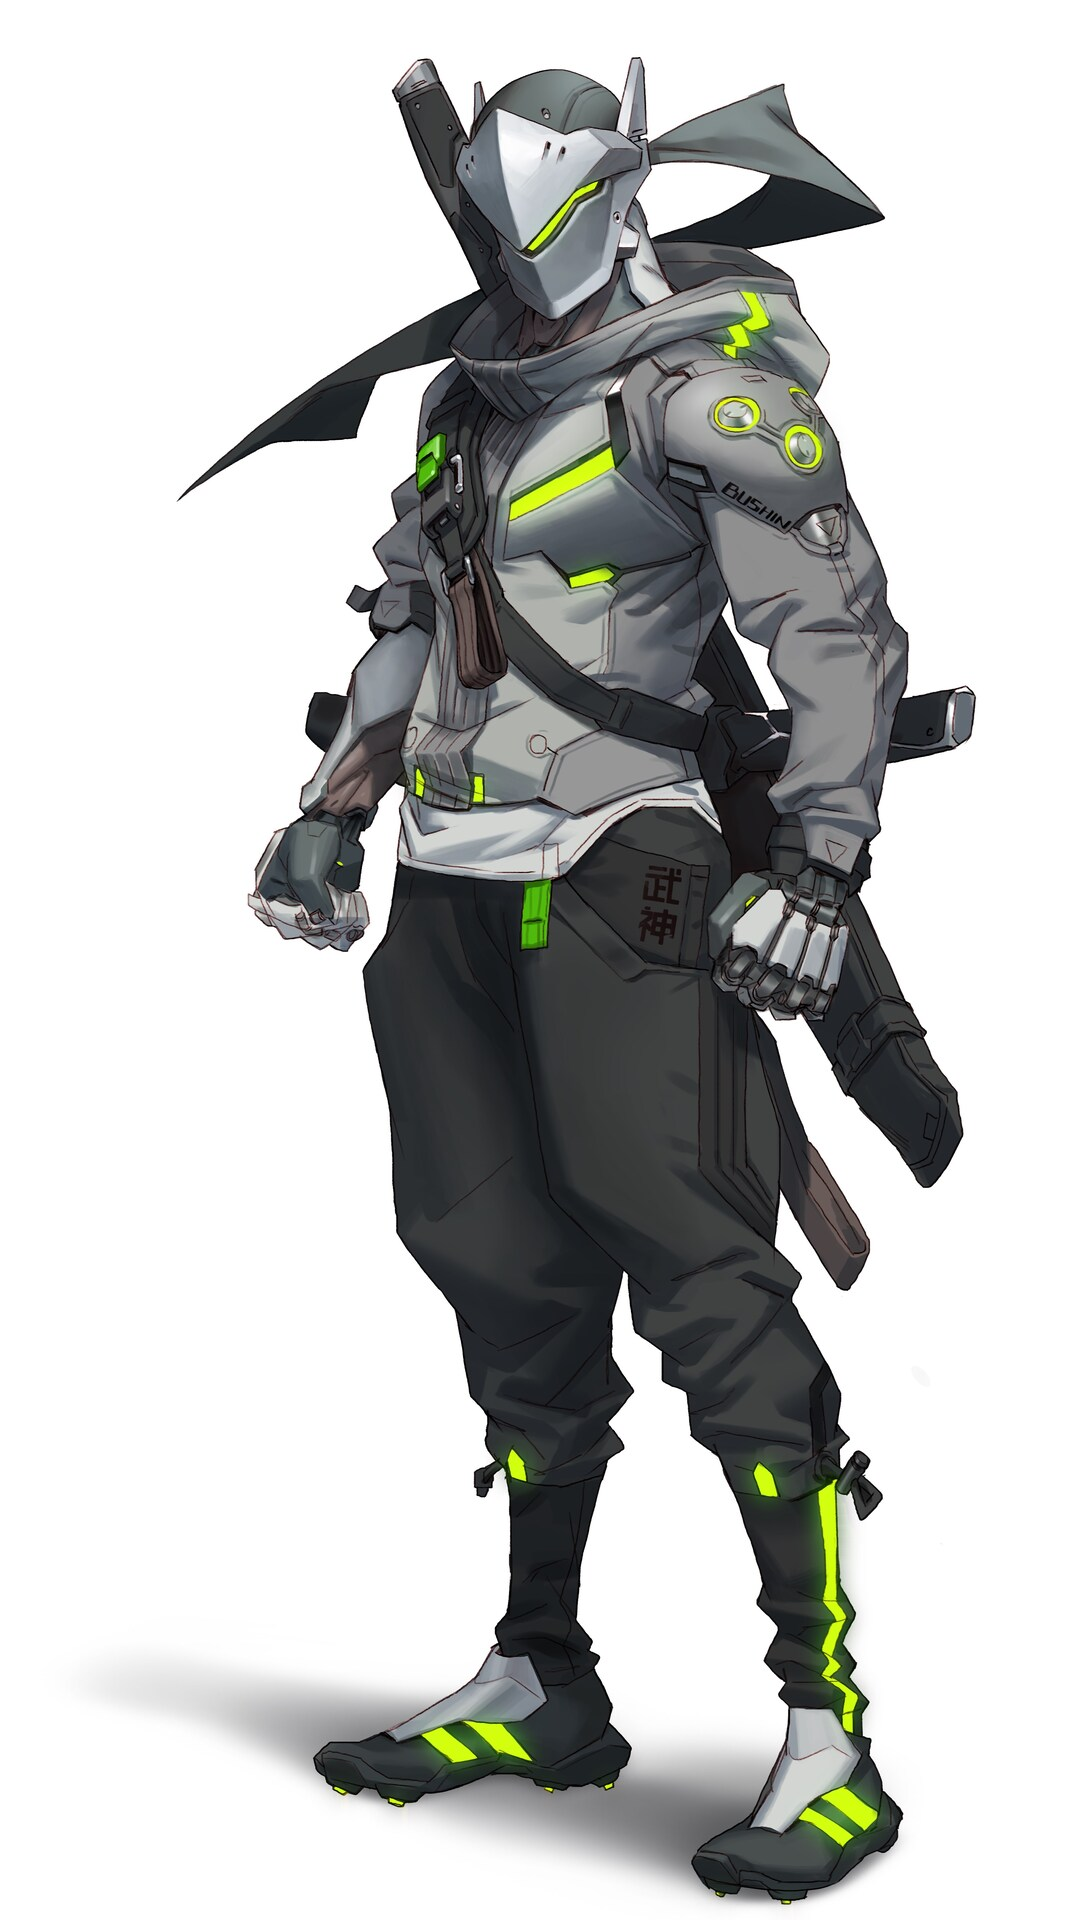 genji-overwatch-2-sf.jpg